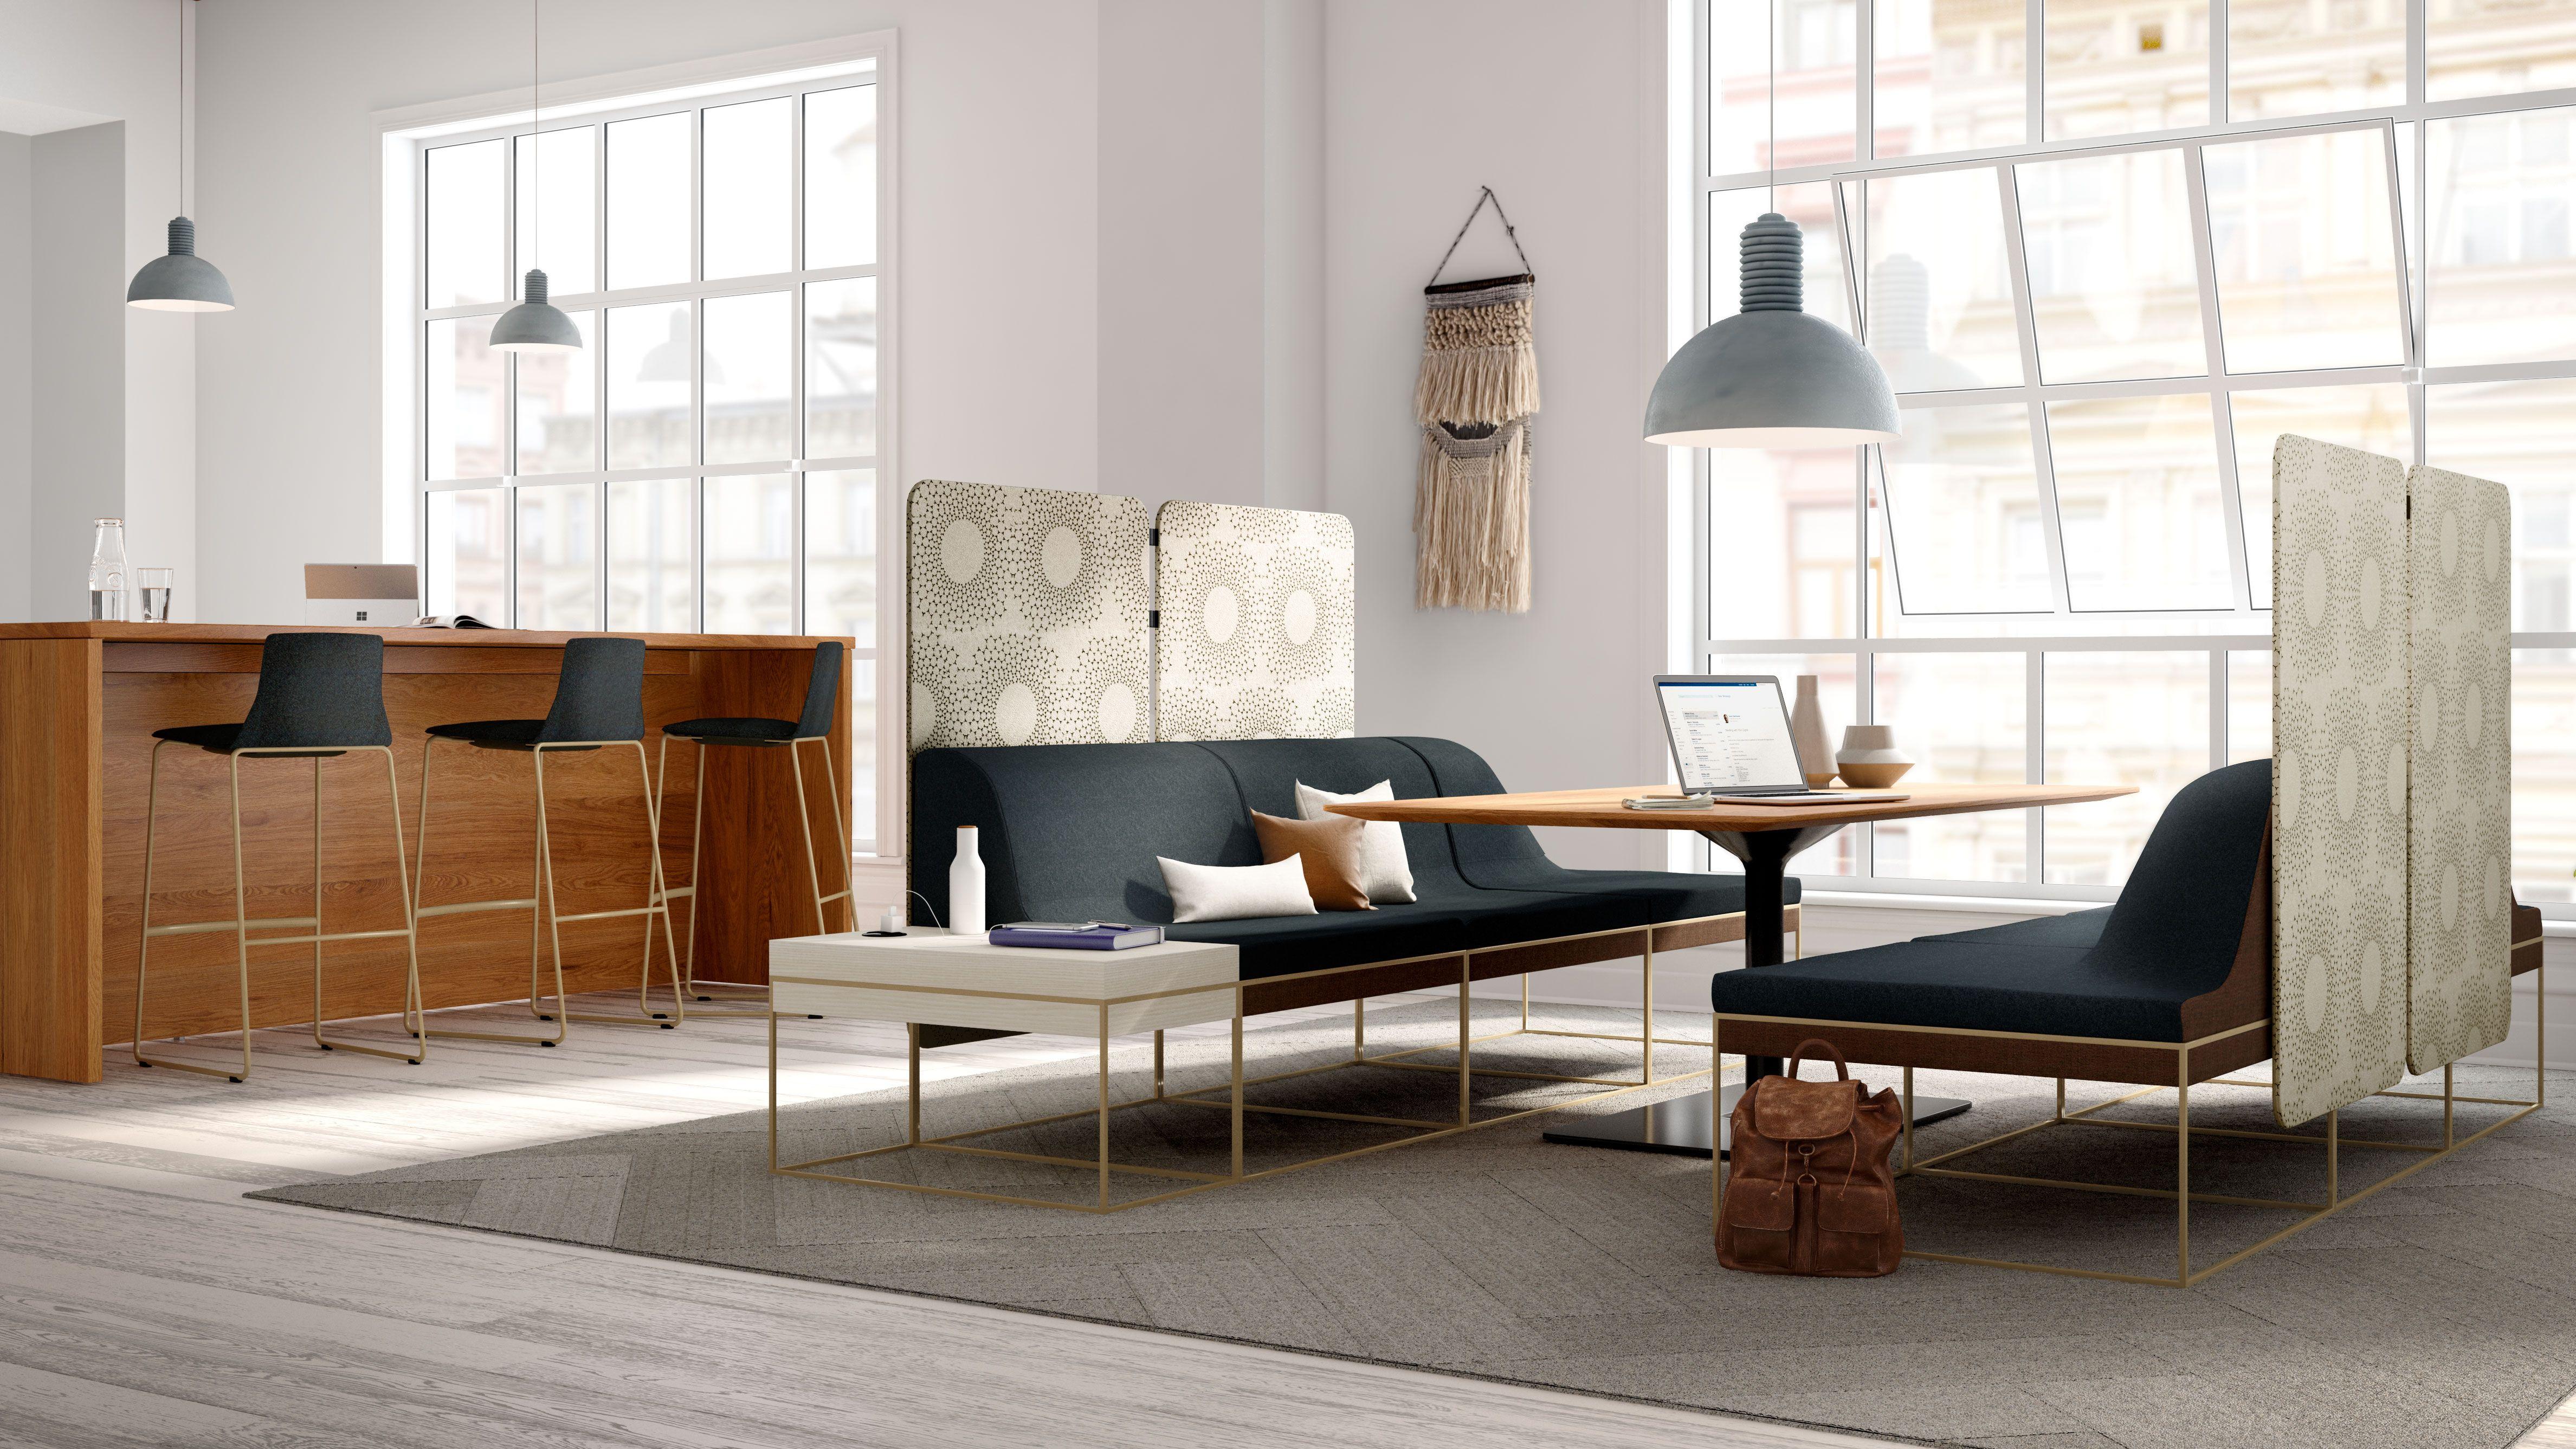 Design Inspiration + Ideas for Modern Office Workspaces | Lighting ...